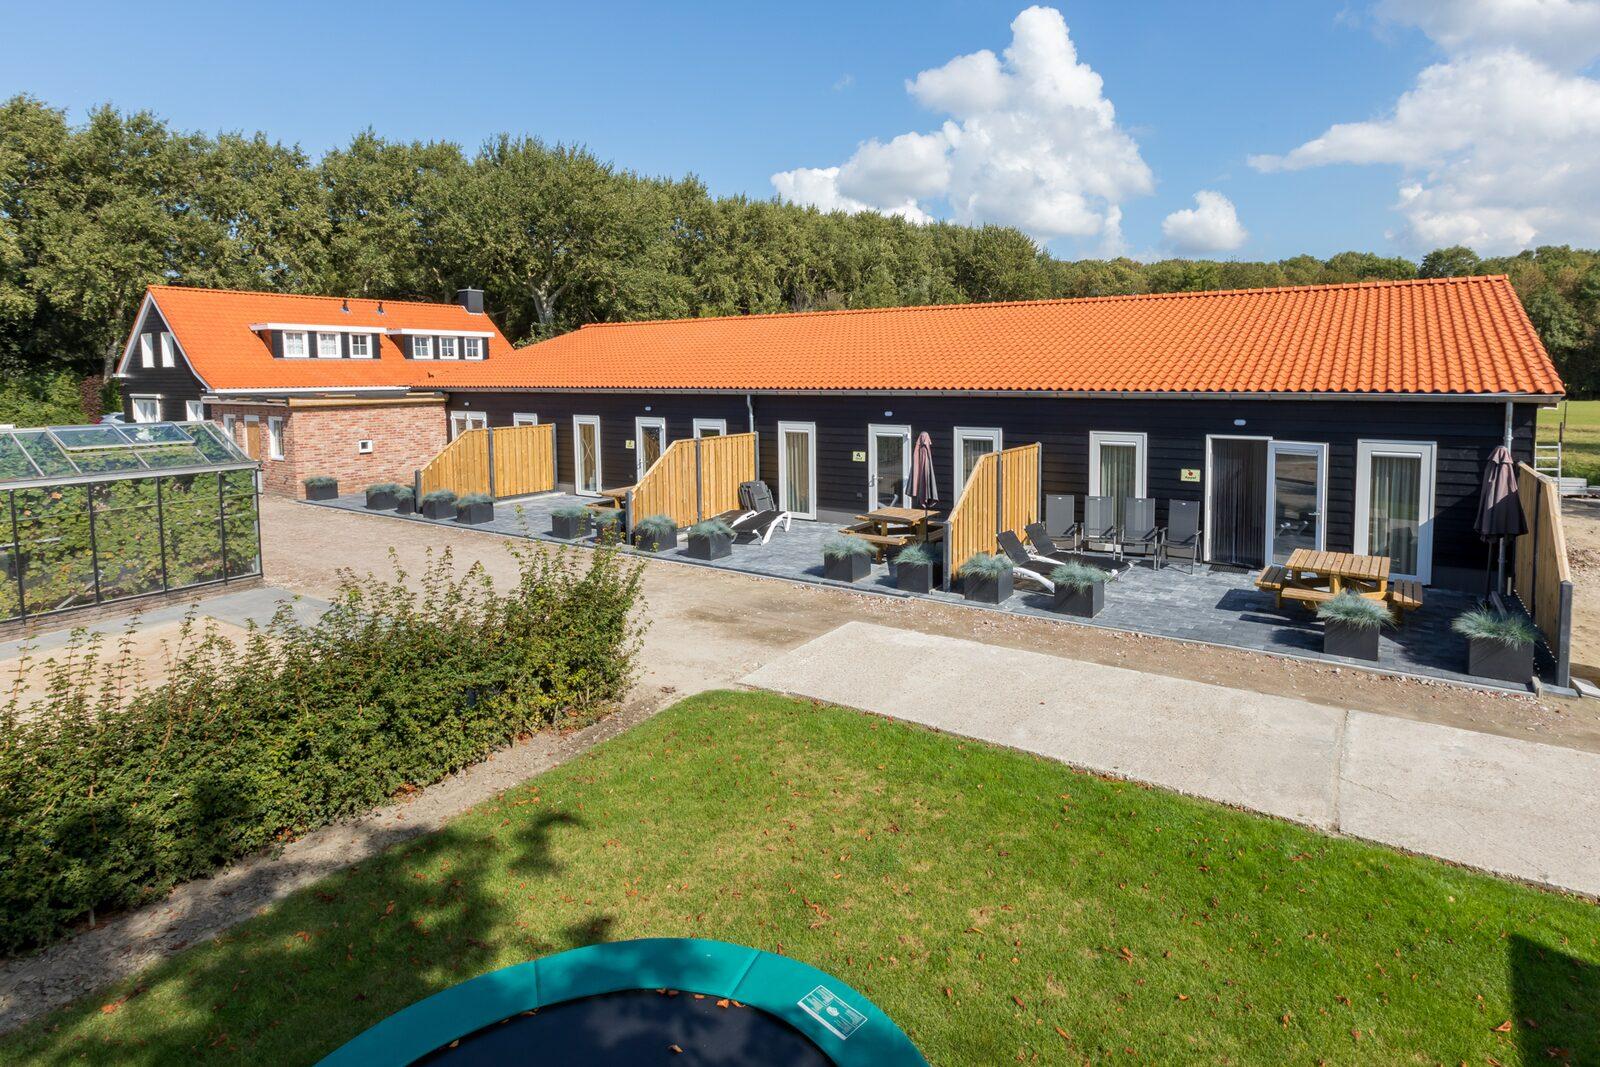 Zeldenrust Farm, Oostkapelle,Zeeland,Netherlands